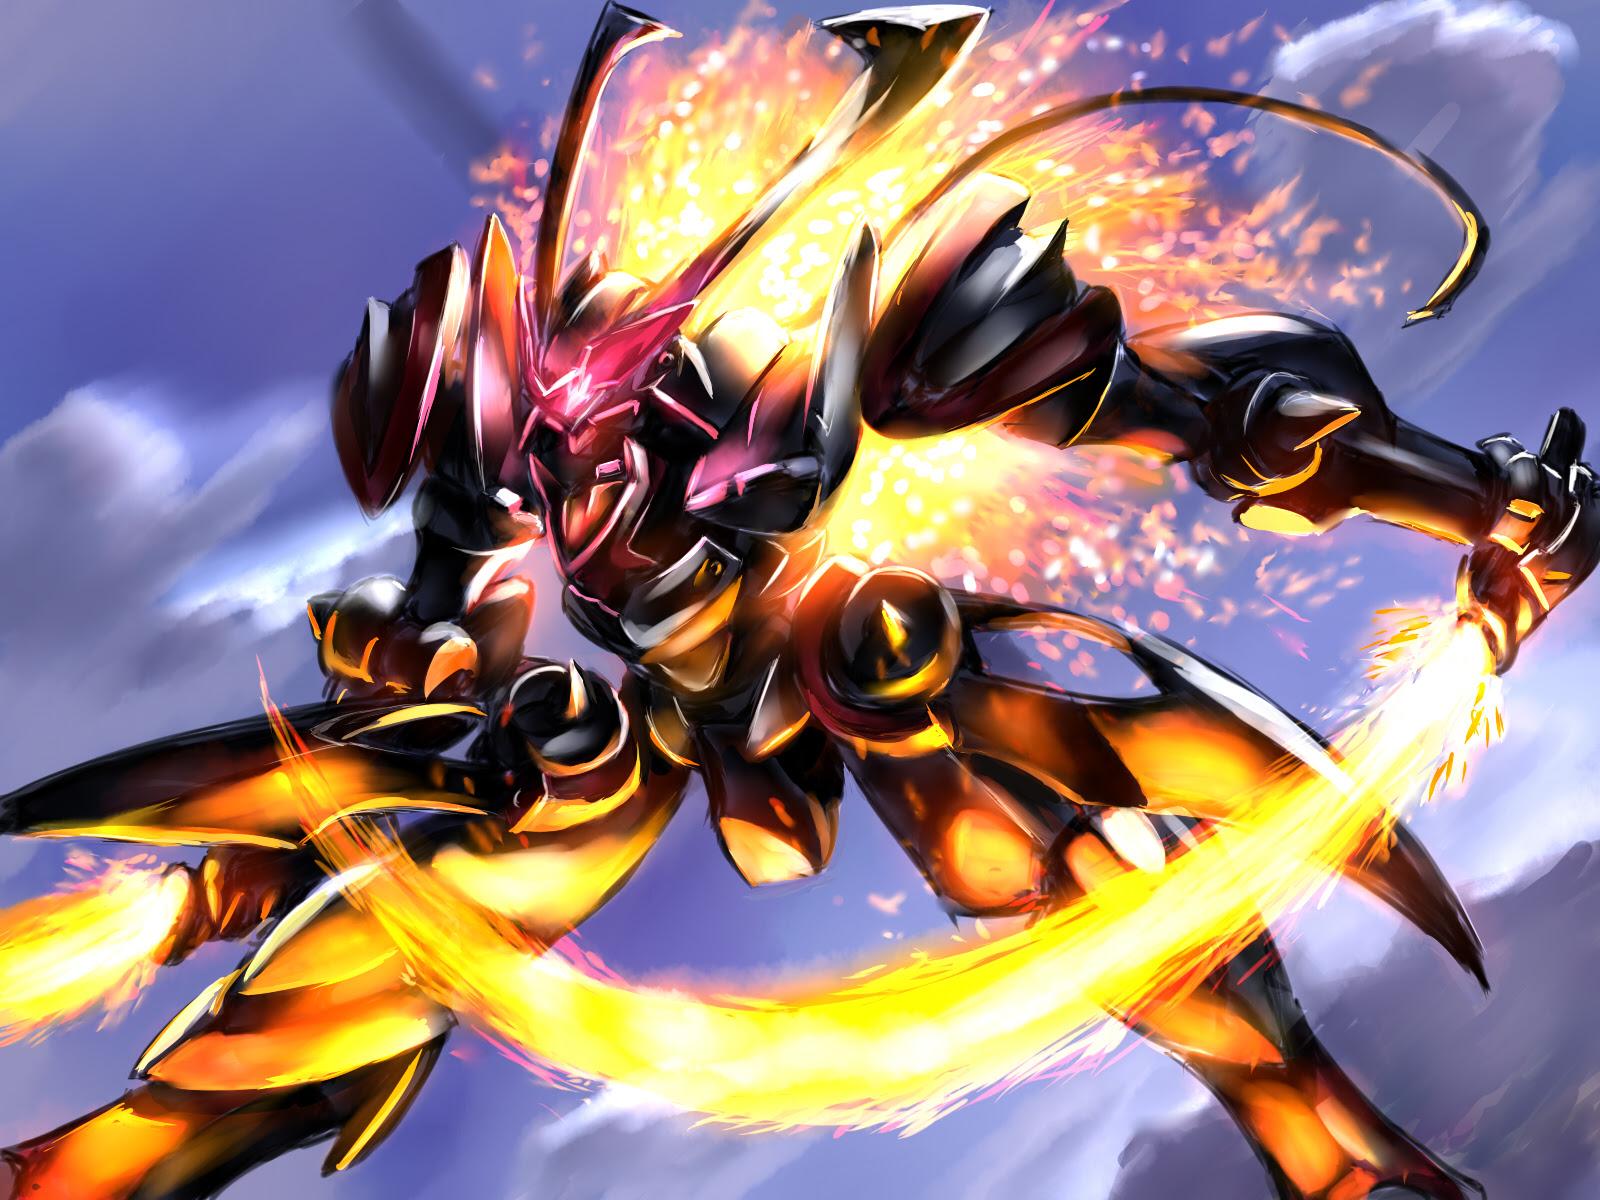 Gundam Mecha 5 アニメ Super ファン 壁紙 36705692 ファンポップ